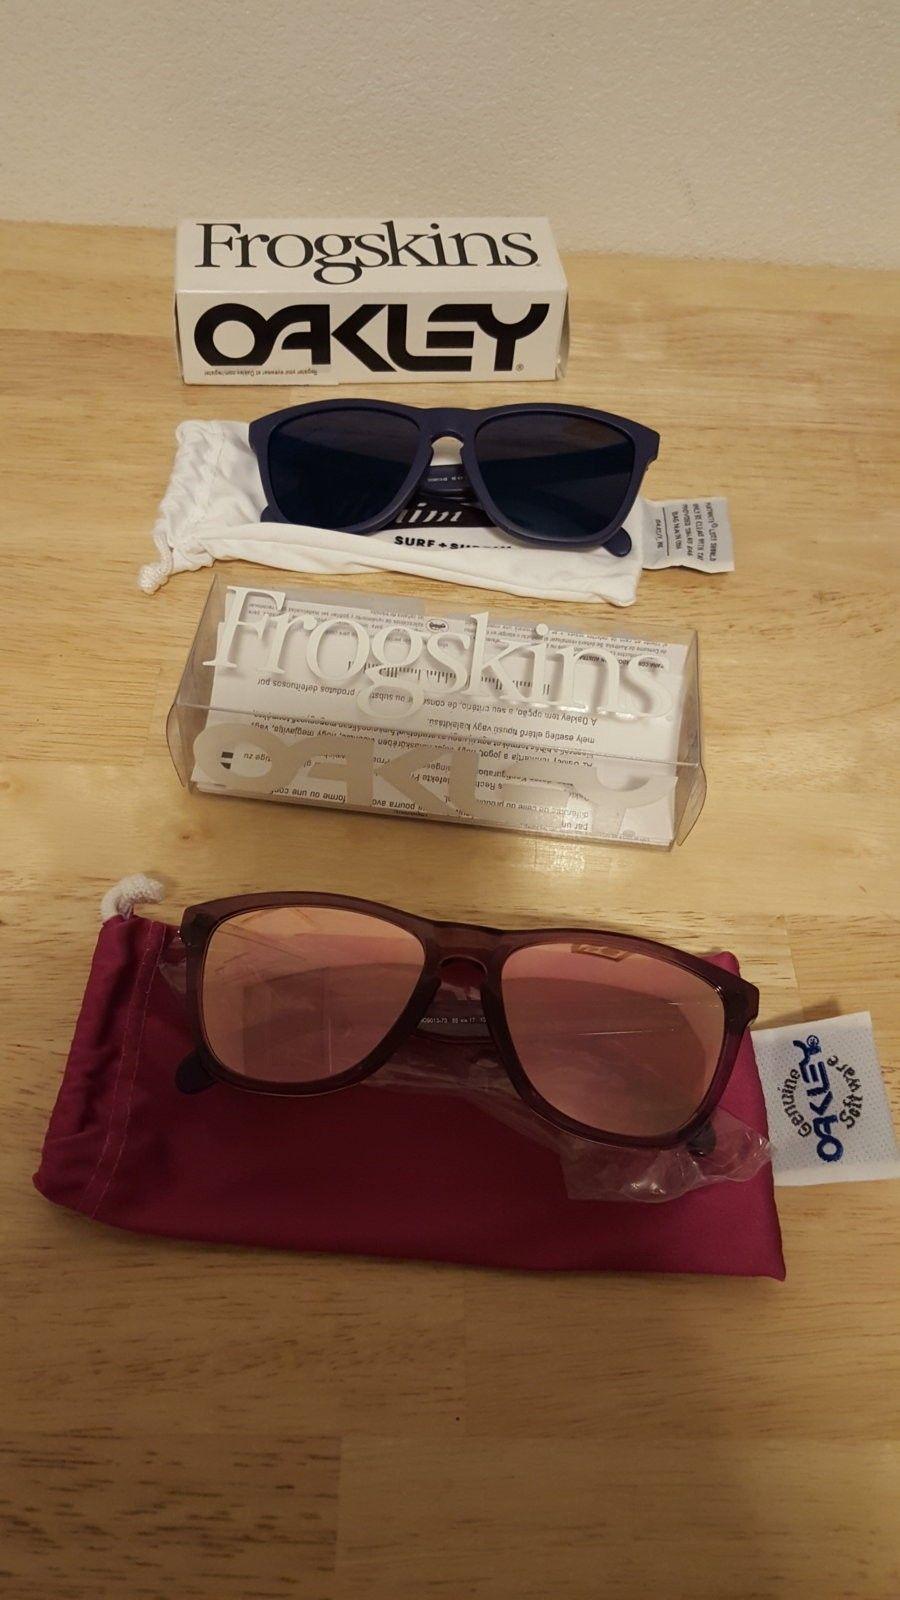 Alpine Pink and Pilgrim Beams Frogskins  $110 Shipped - 20160216_063610.jpg